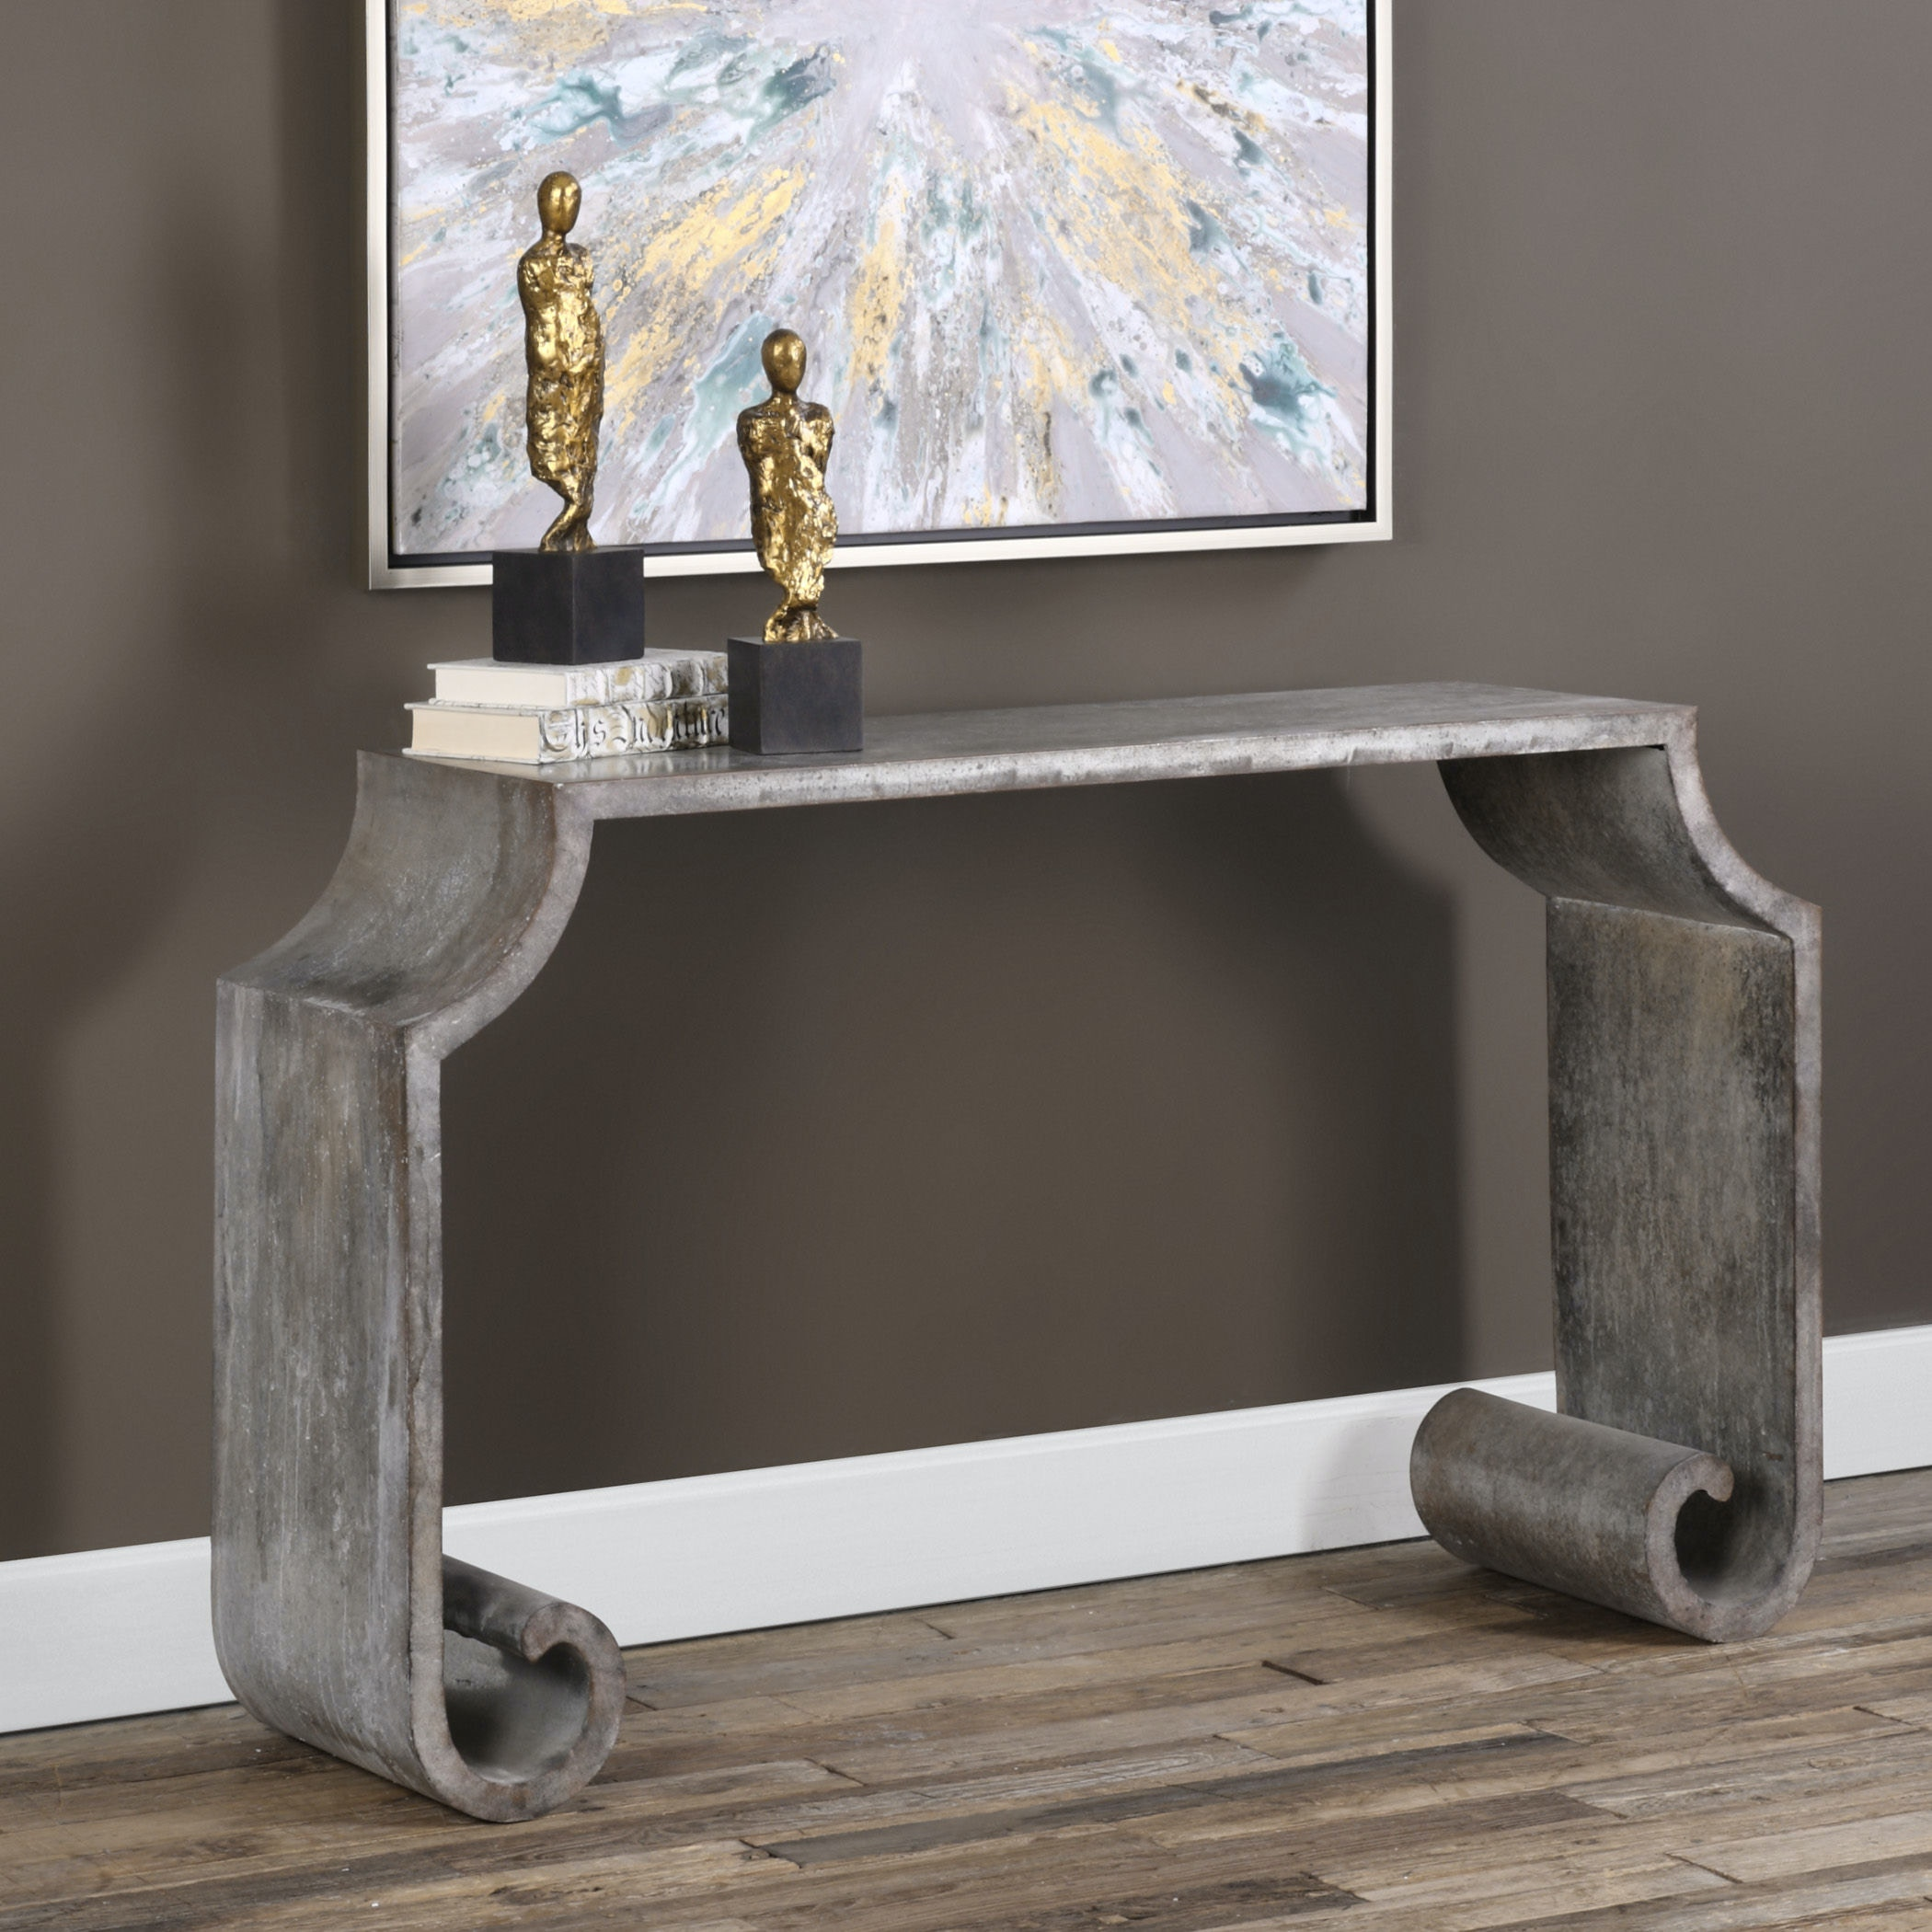 Uttermost Agathon Stone Gray Console Table 24672